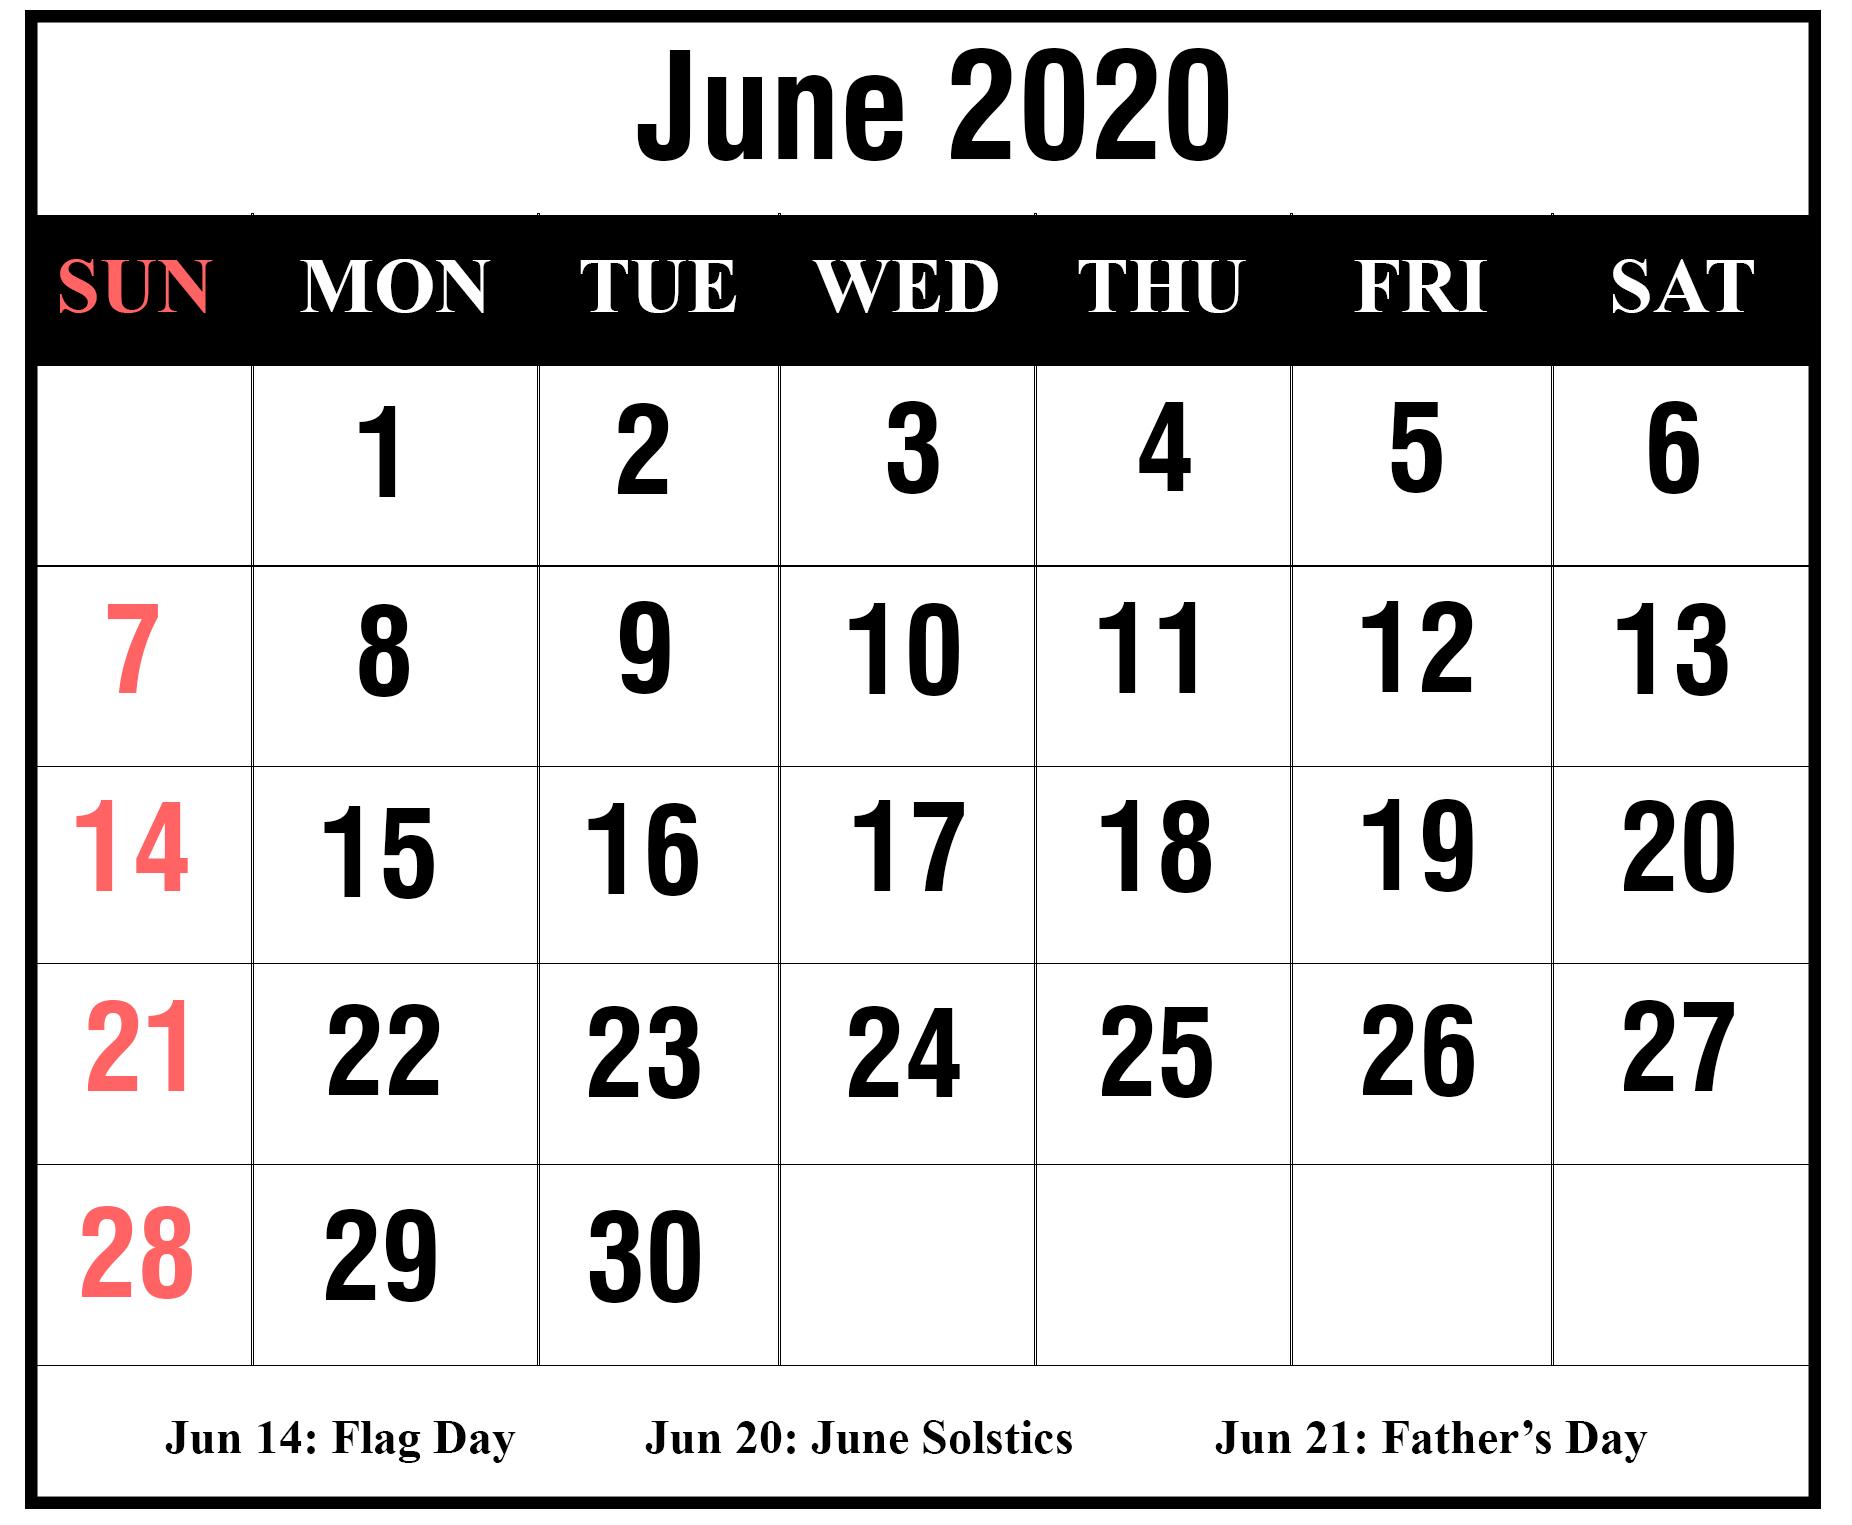 Free Blank June 2020 Printable Calendar With Holidays [Pdf